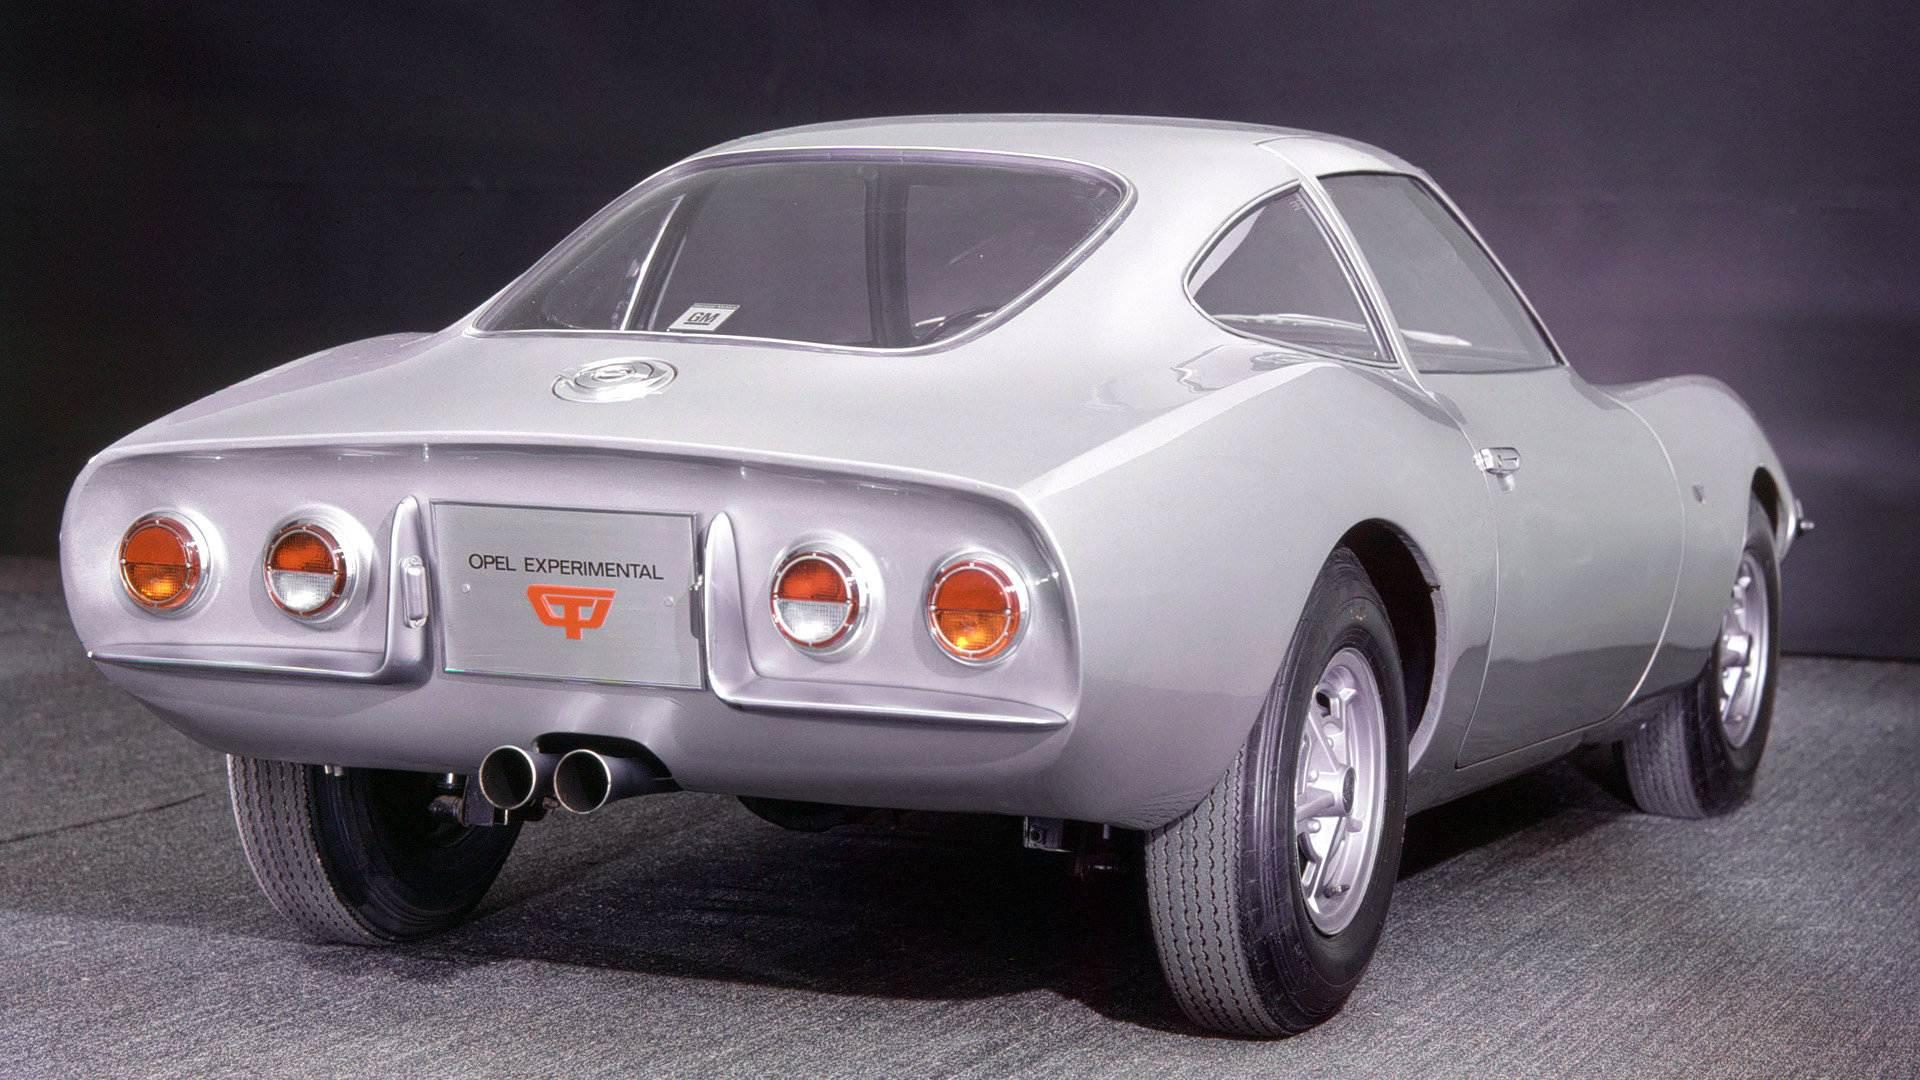 Opel GT Experimental (1965)